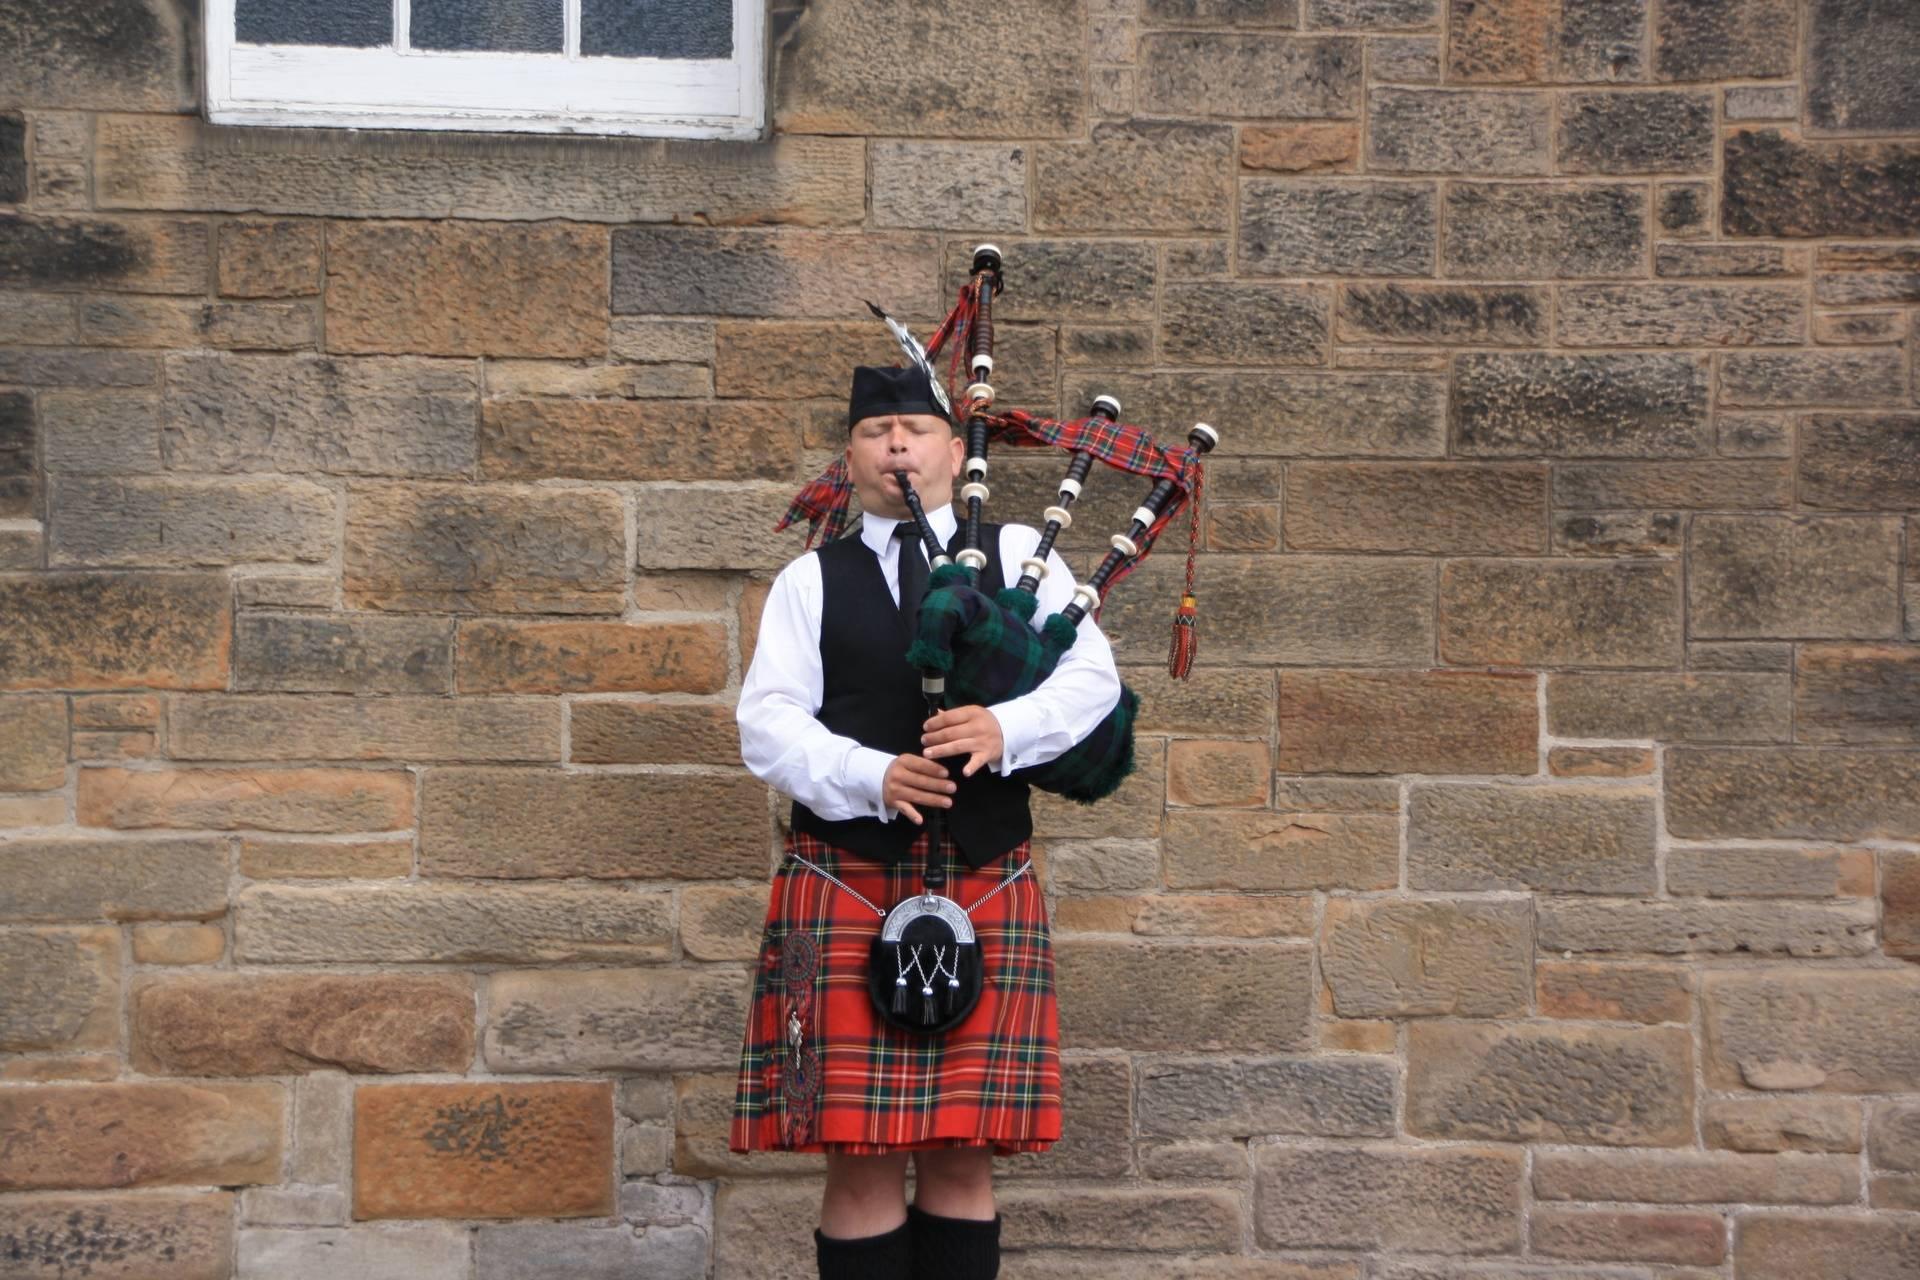 Bagpipes at Edinburgh Castle